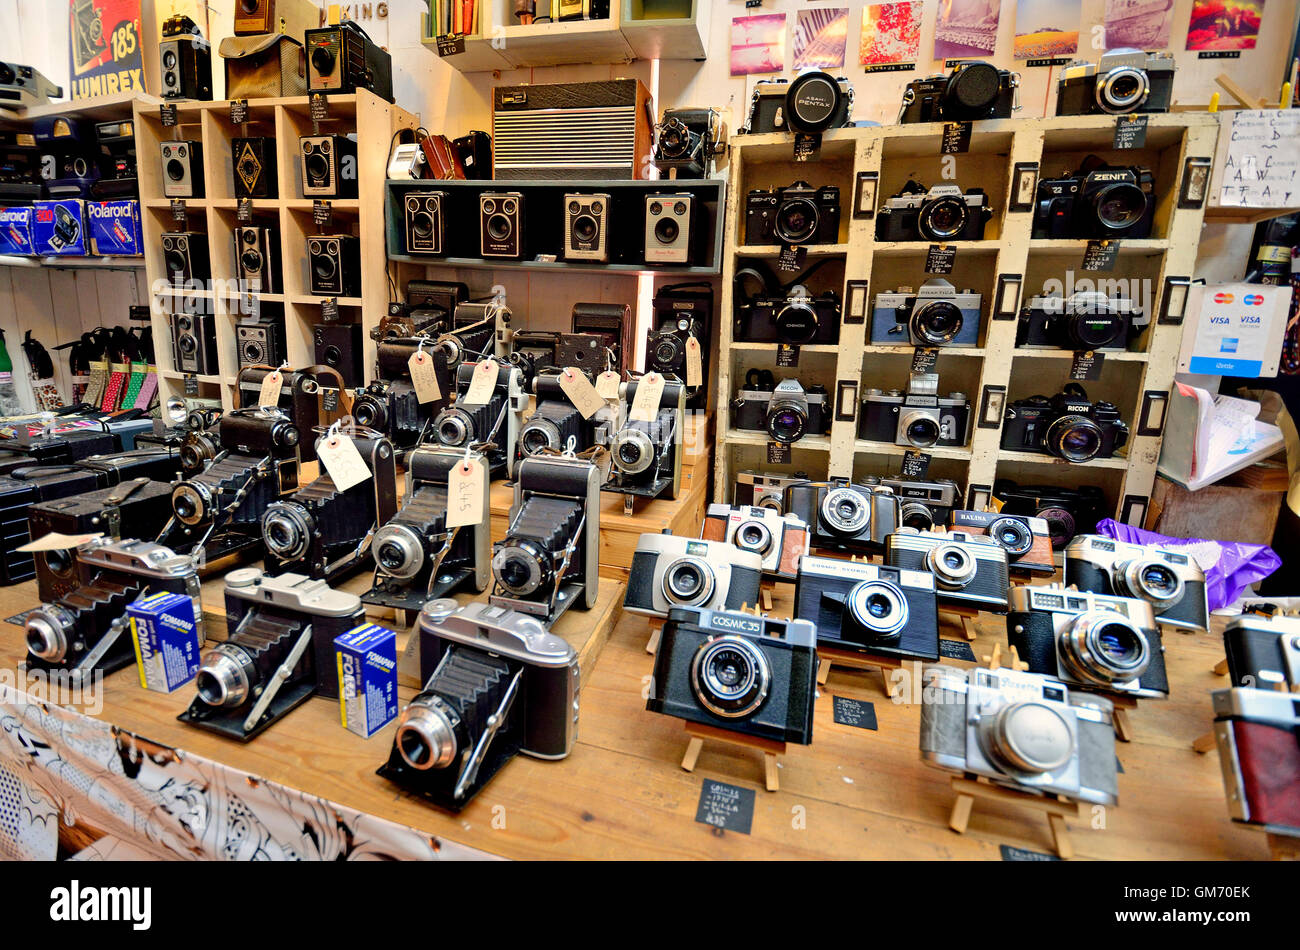 London England, UK. Camden Market - stall with vintage cameras - Stock Image